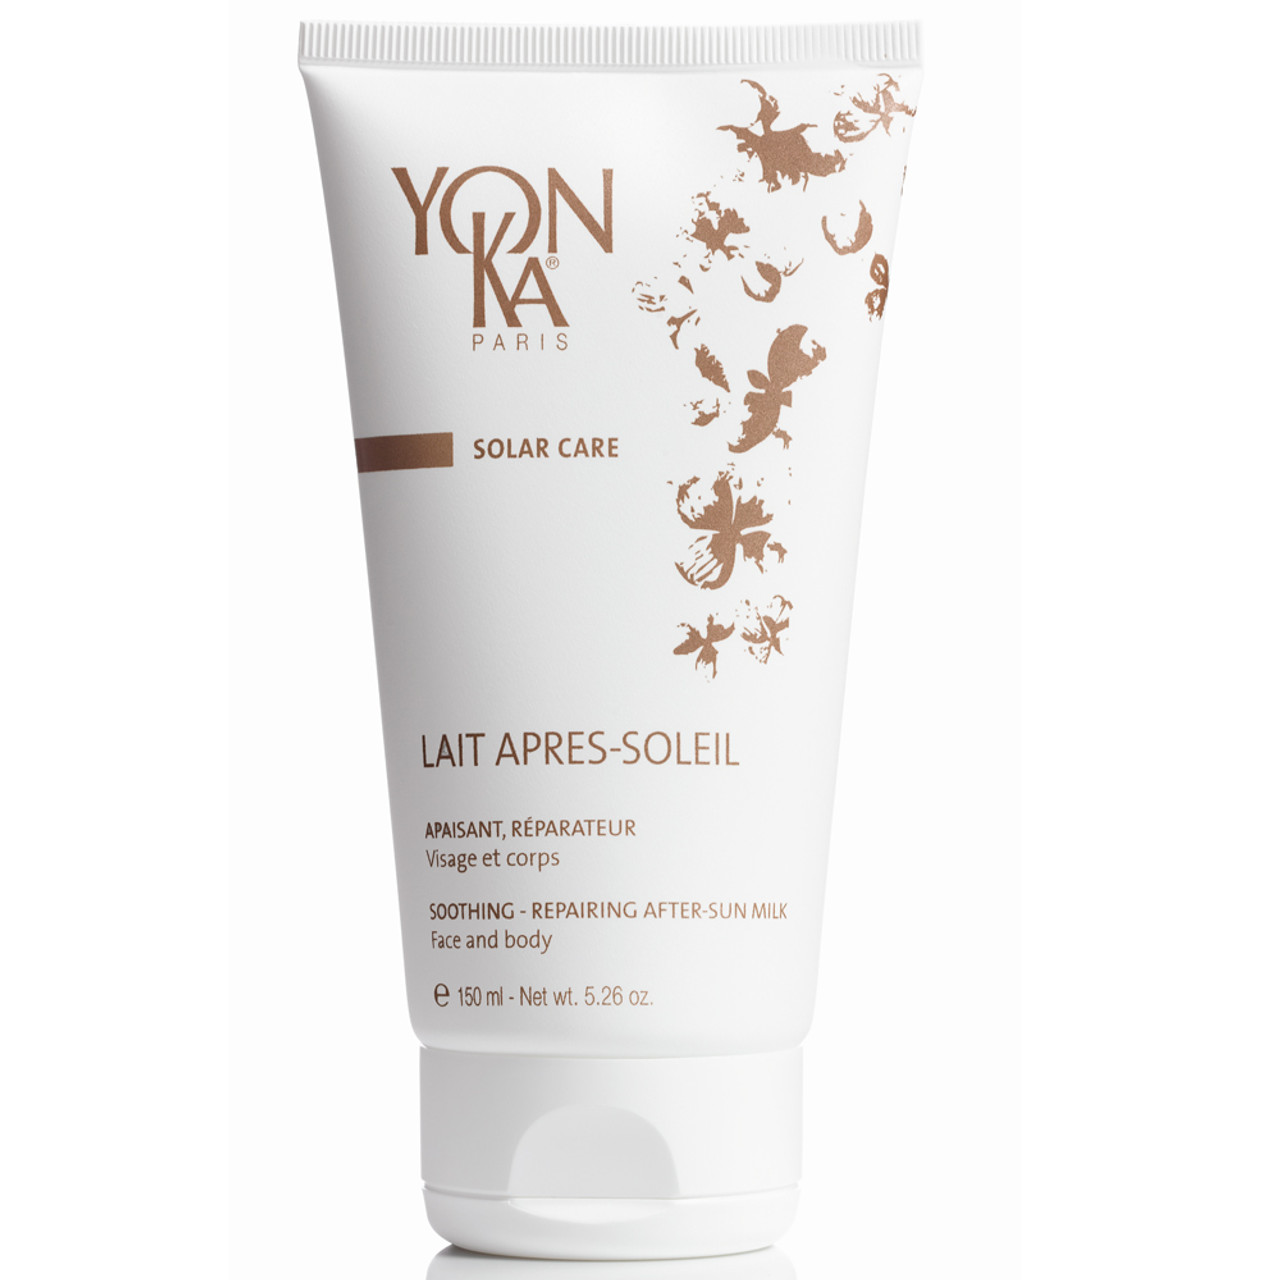 YonKa Lait Apres Soleil Soothing After-Sun Milk